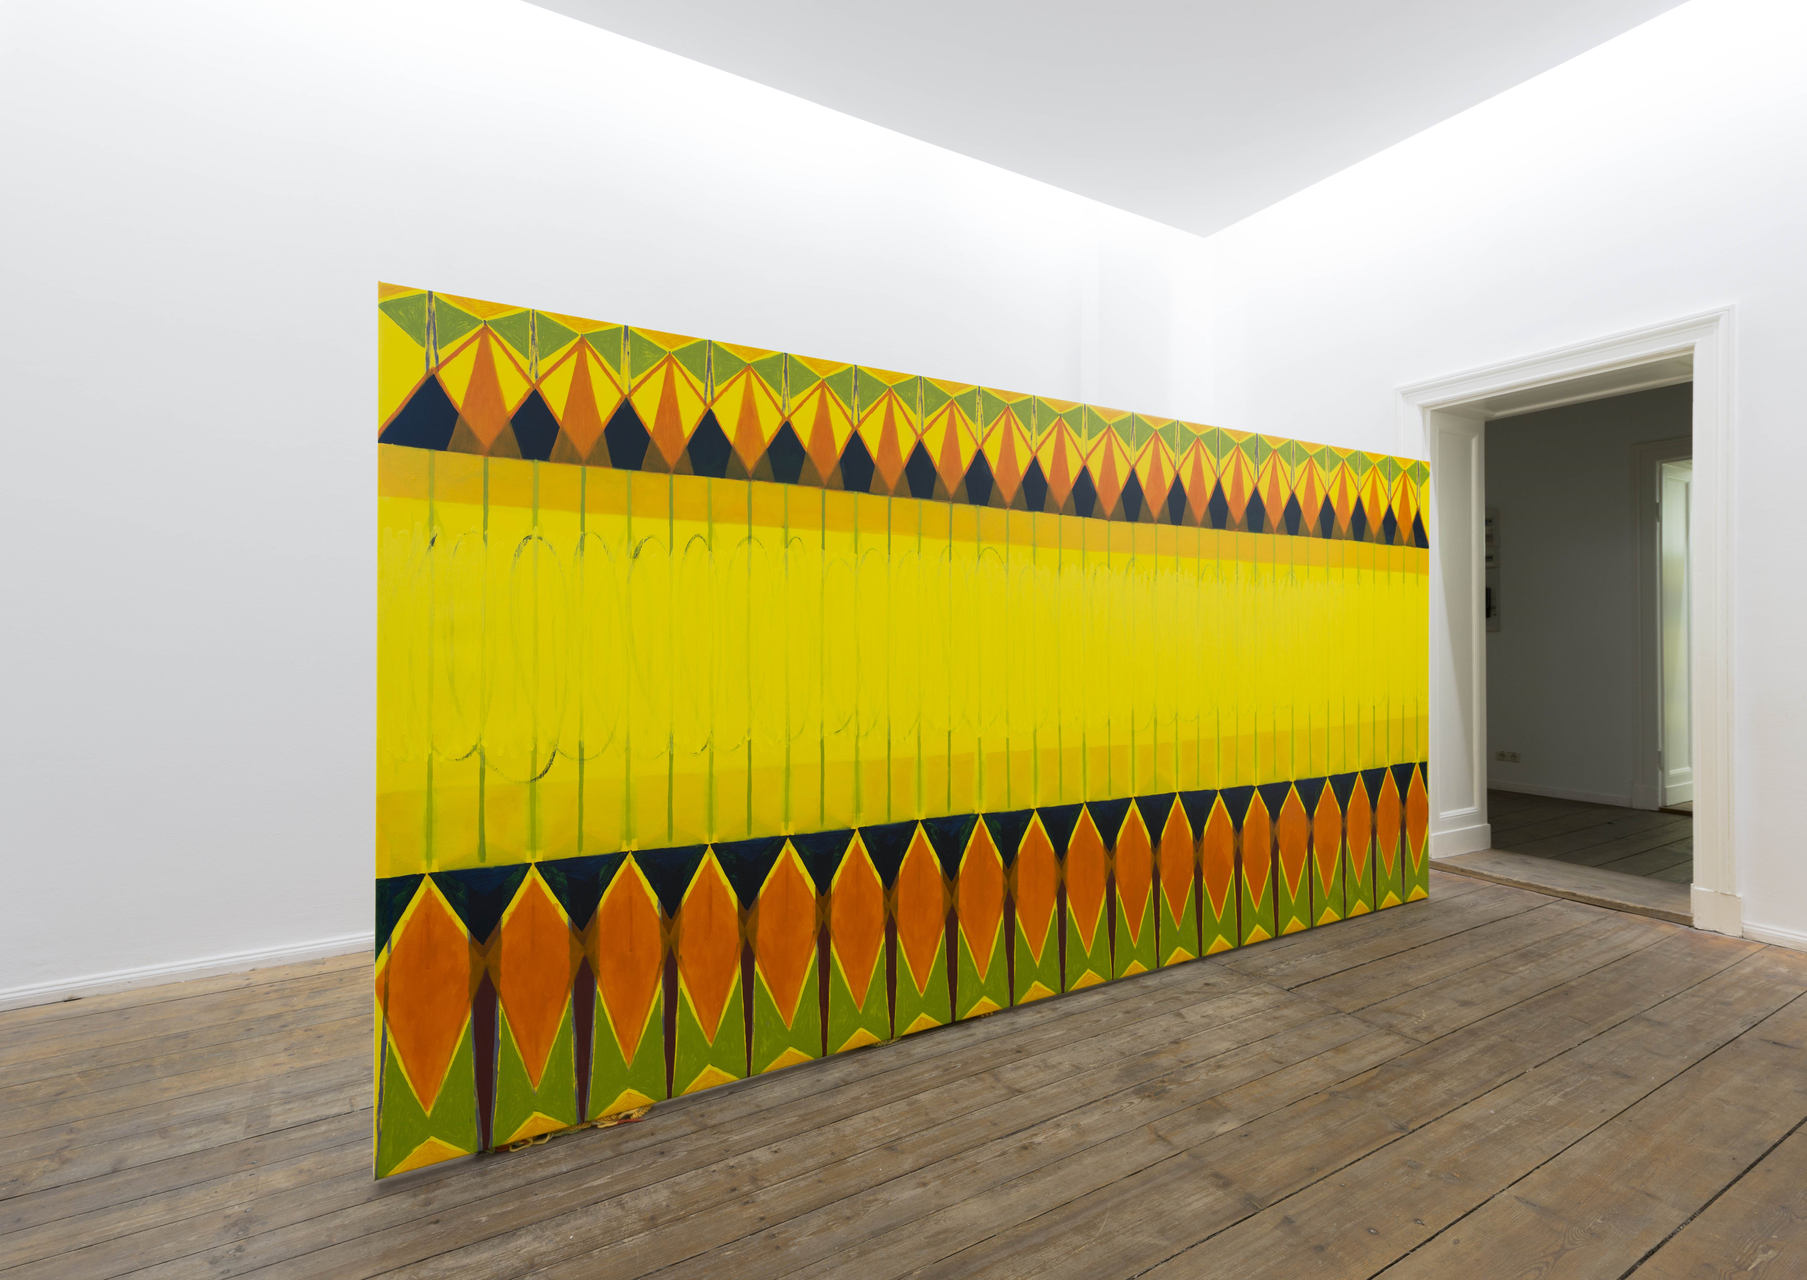 TGood TSJO¦êRBERG artdoc Grimmuseum 27 02 2015 _0108